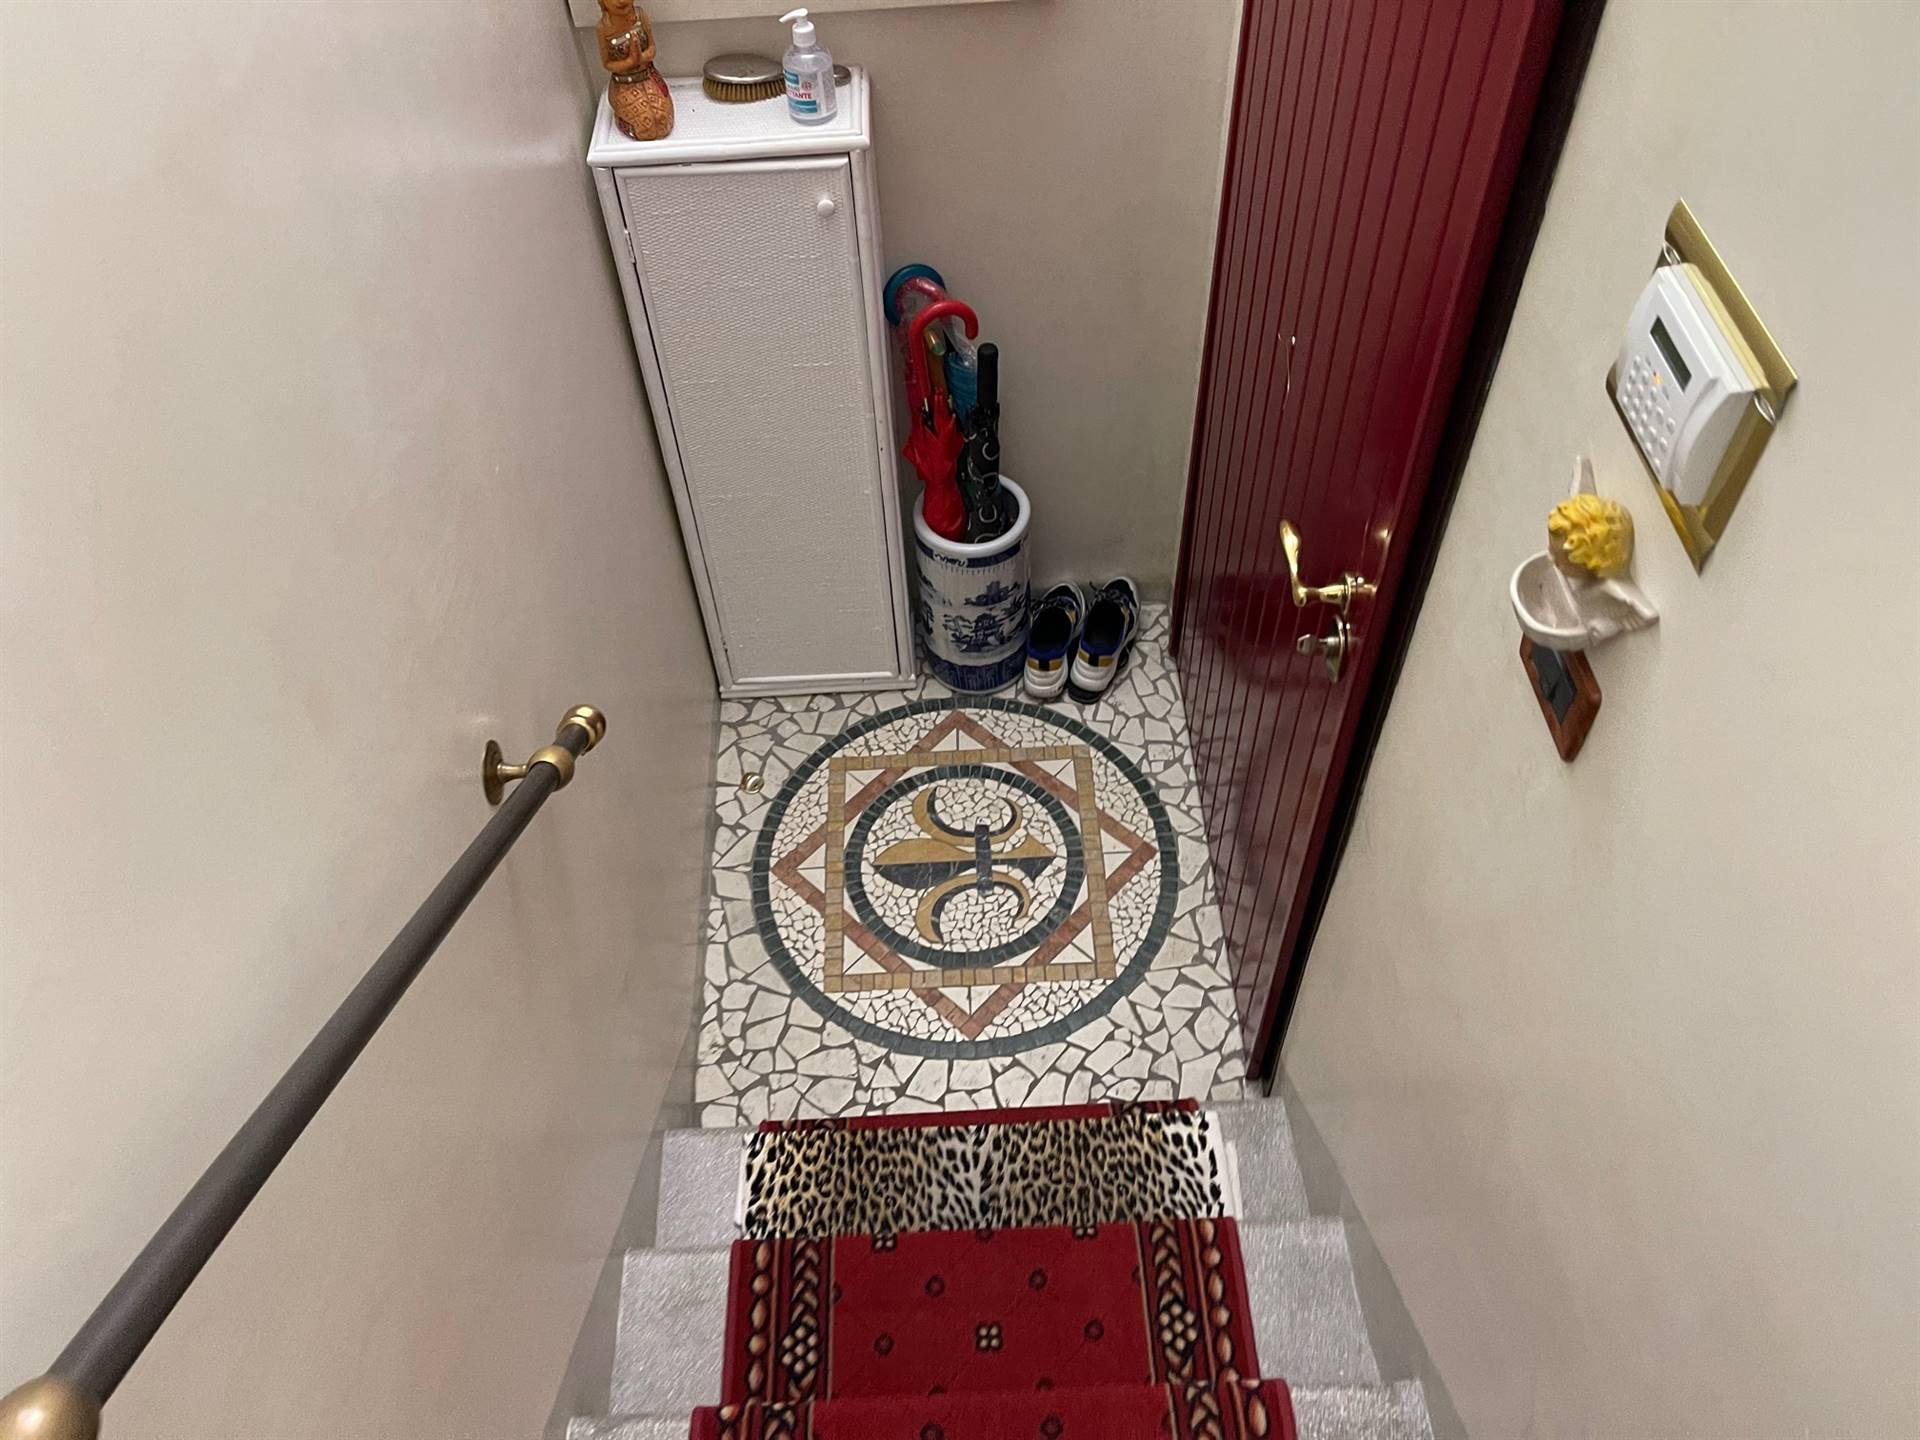 ingresso indipendente bell'appartamento Mestre